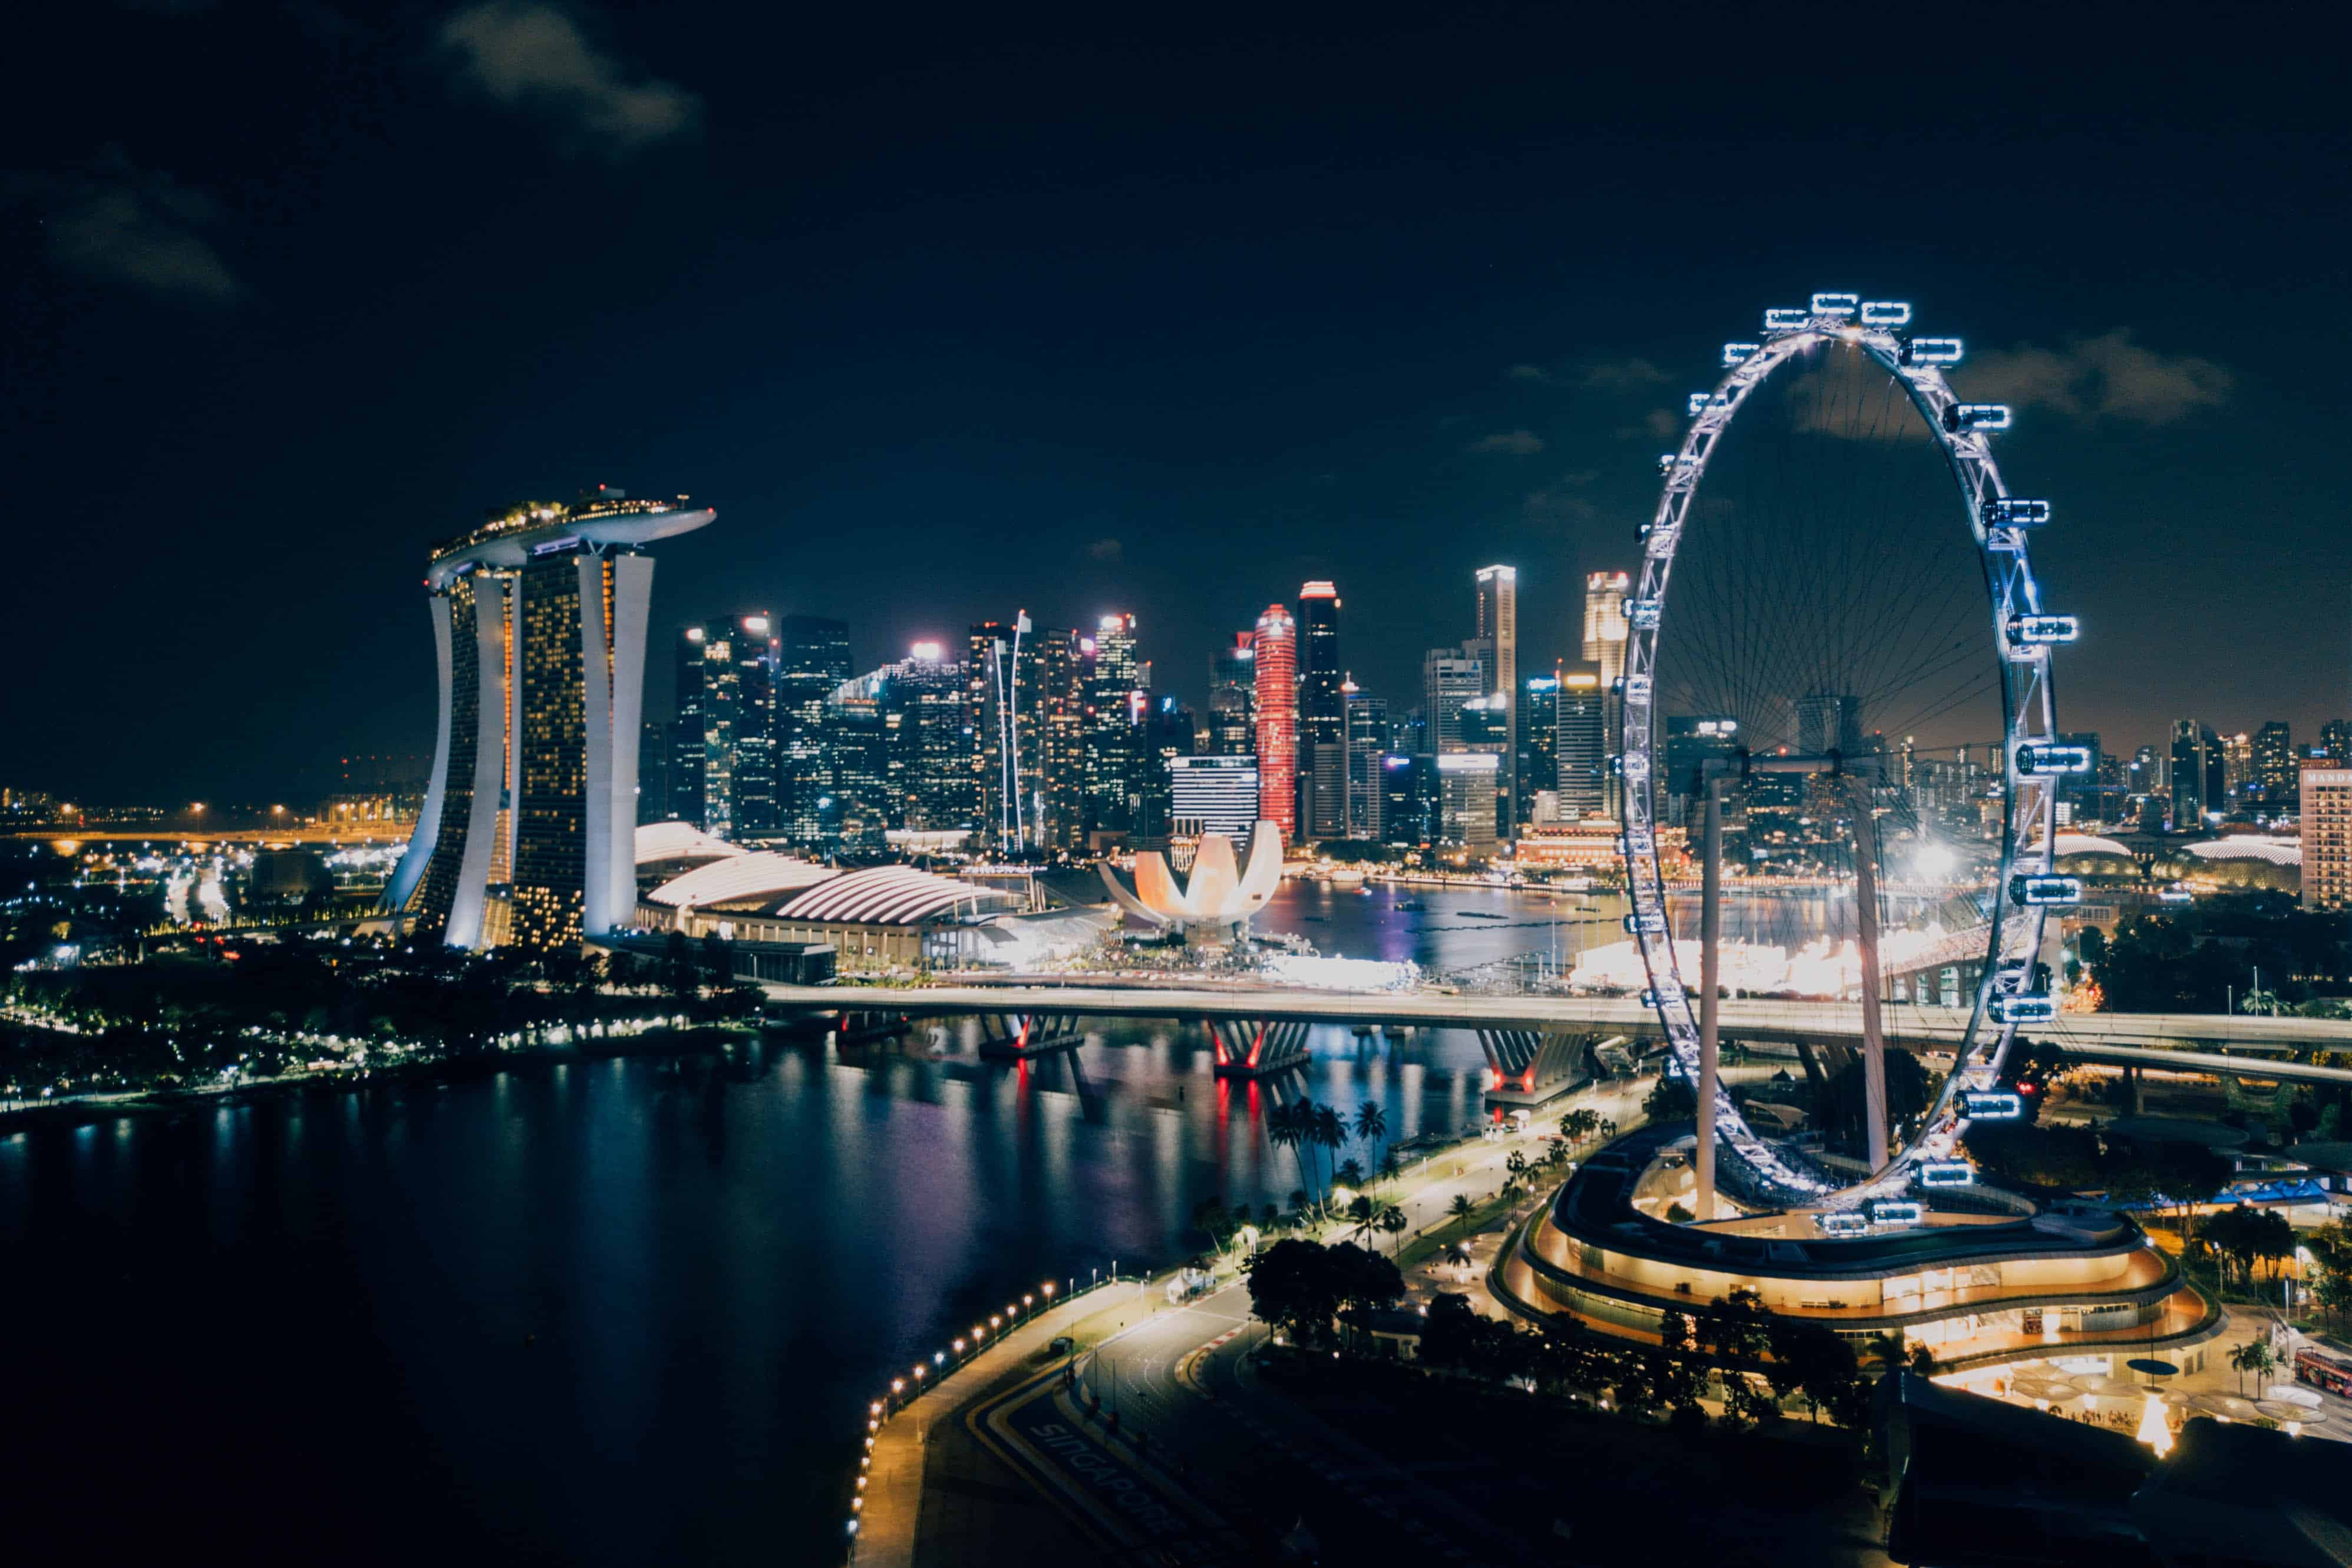 singapore flyer, singapore facts